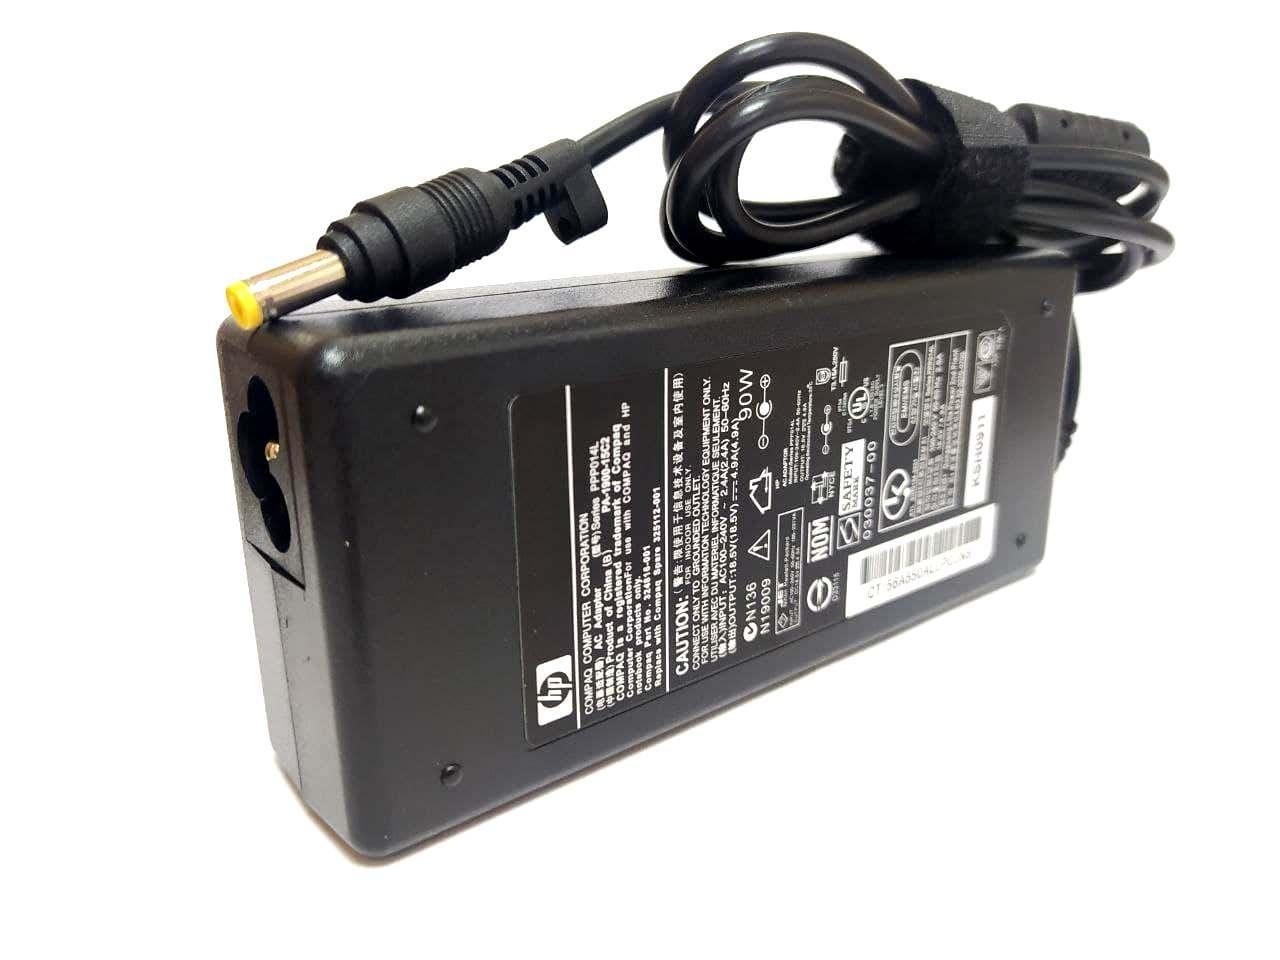 Блок питания для ноутбука HP Pavilion DV6800 18.5V 4.9A 4.8*1.7mm 90W